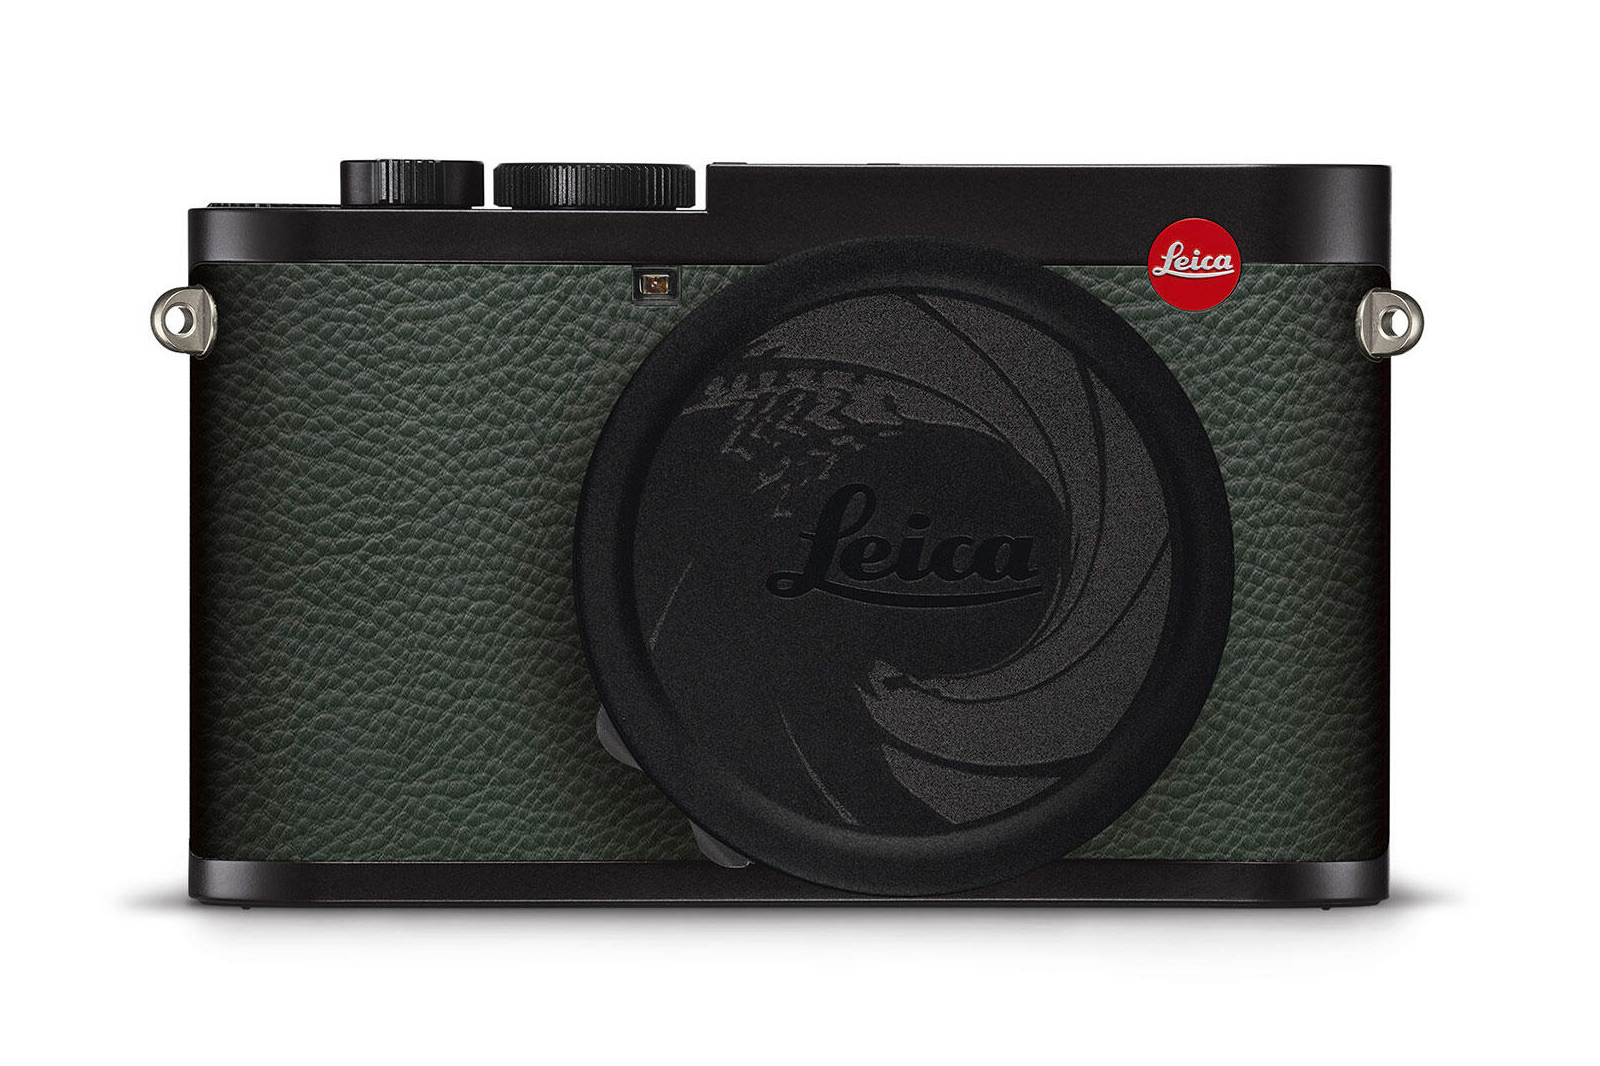 Leica Q2 '007' Camera